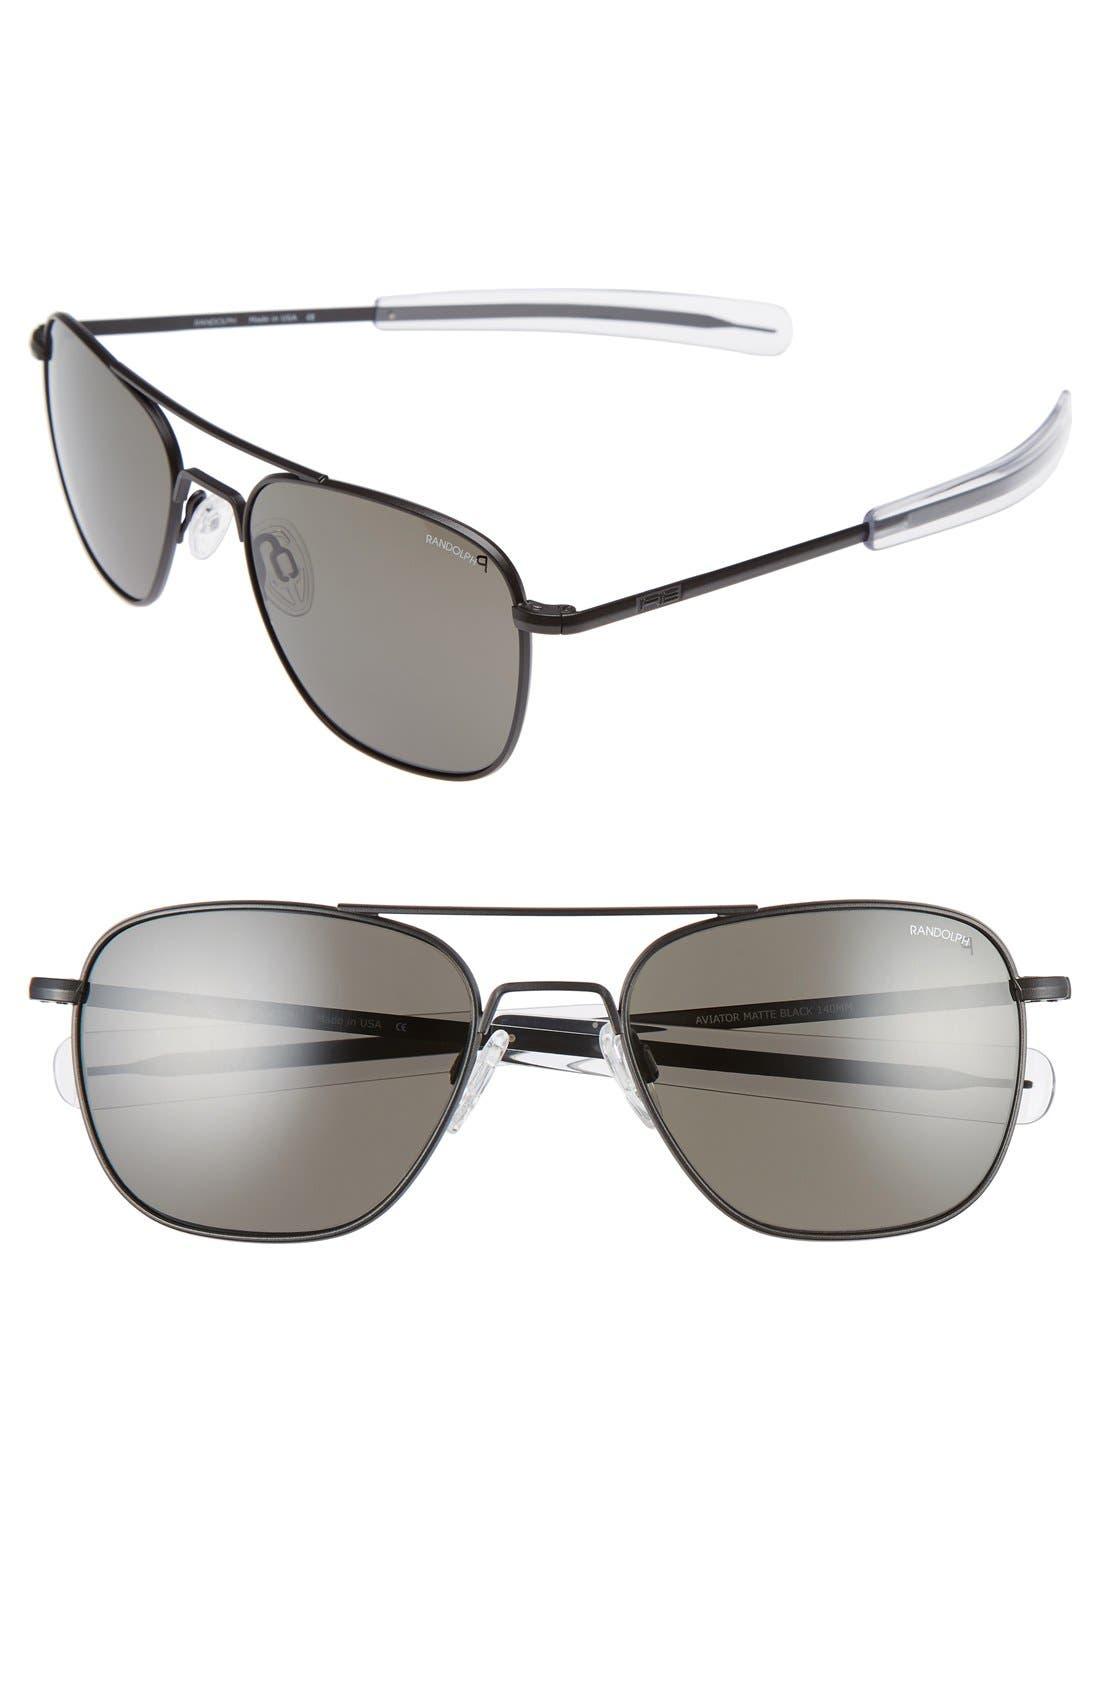 Main Image - Randolph Engineering 55mm Polarized Aviator Sunglasses